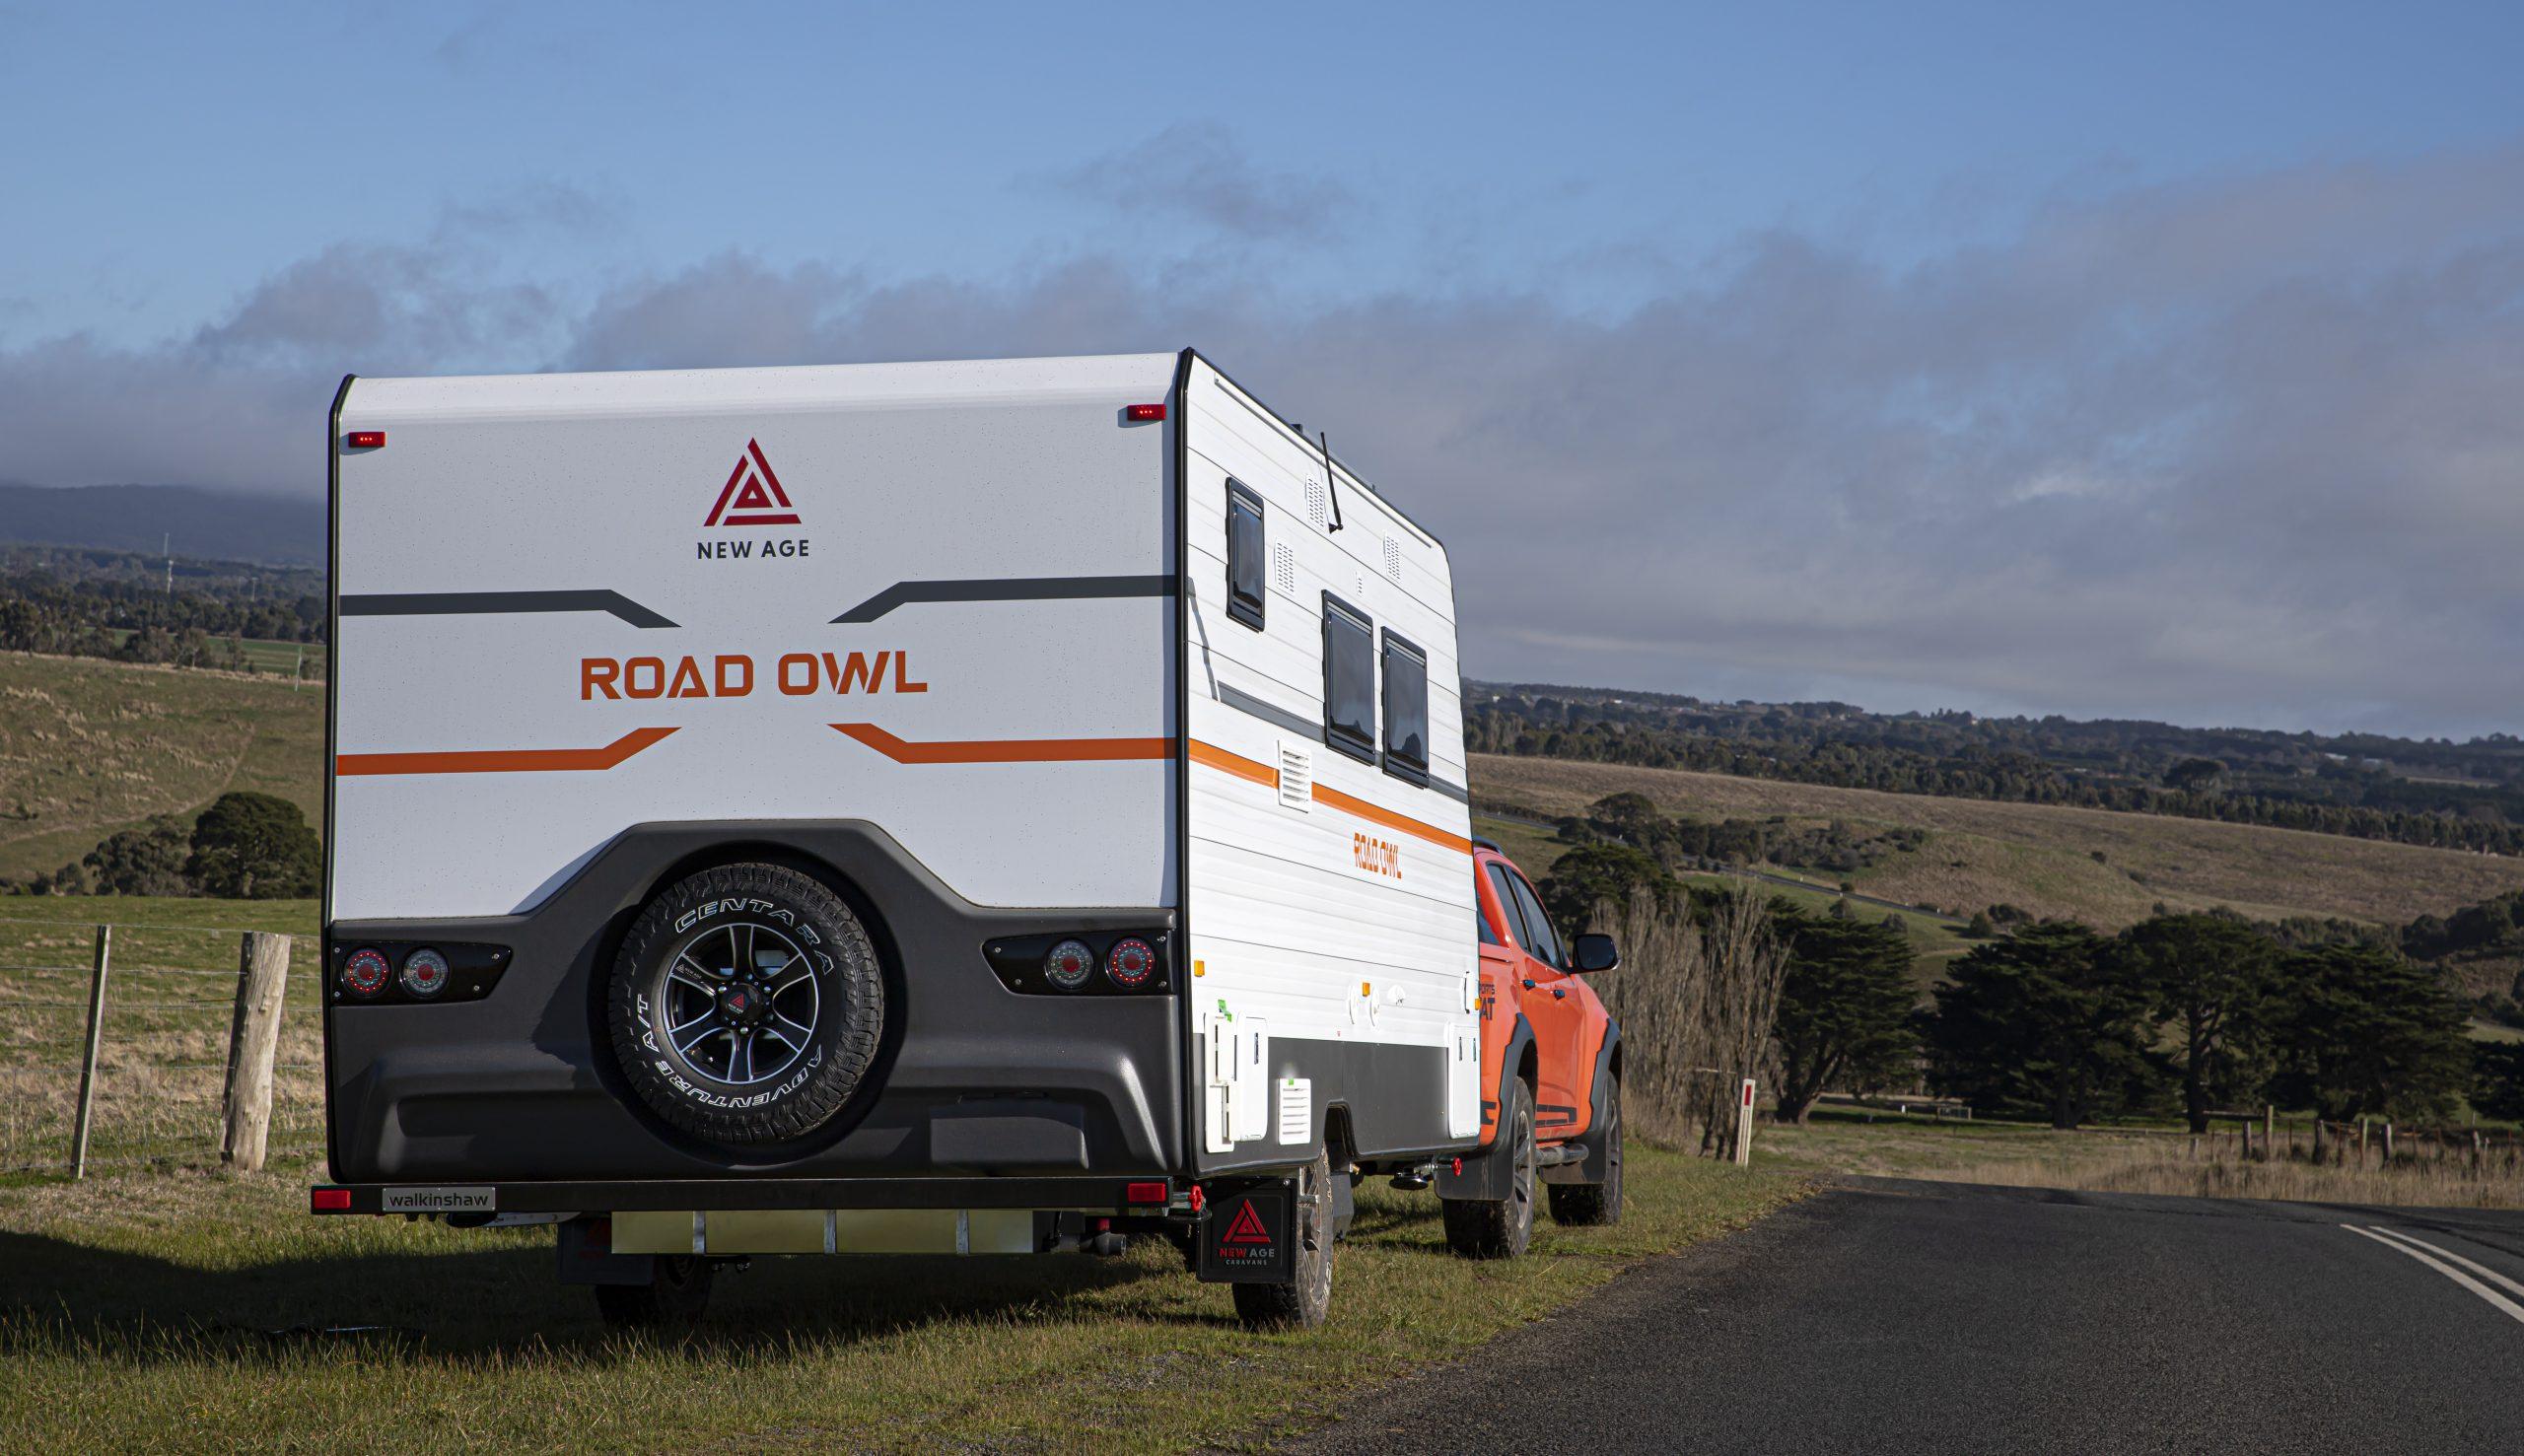 HERO image of New Age caravan driving down the highway